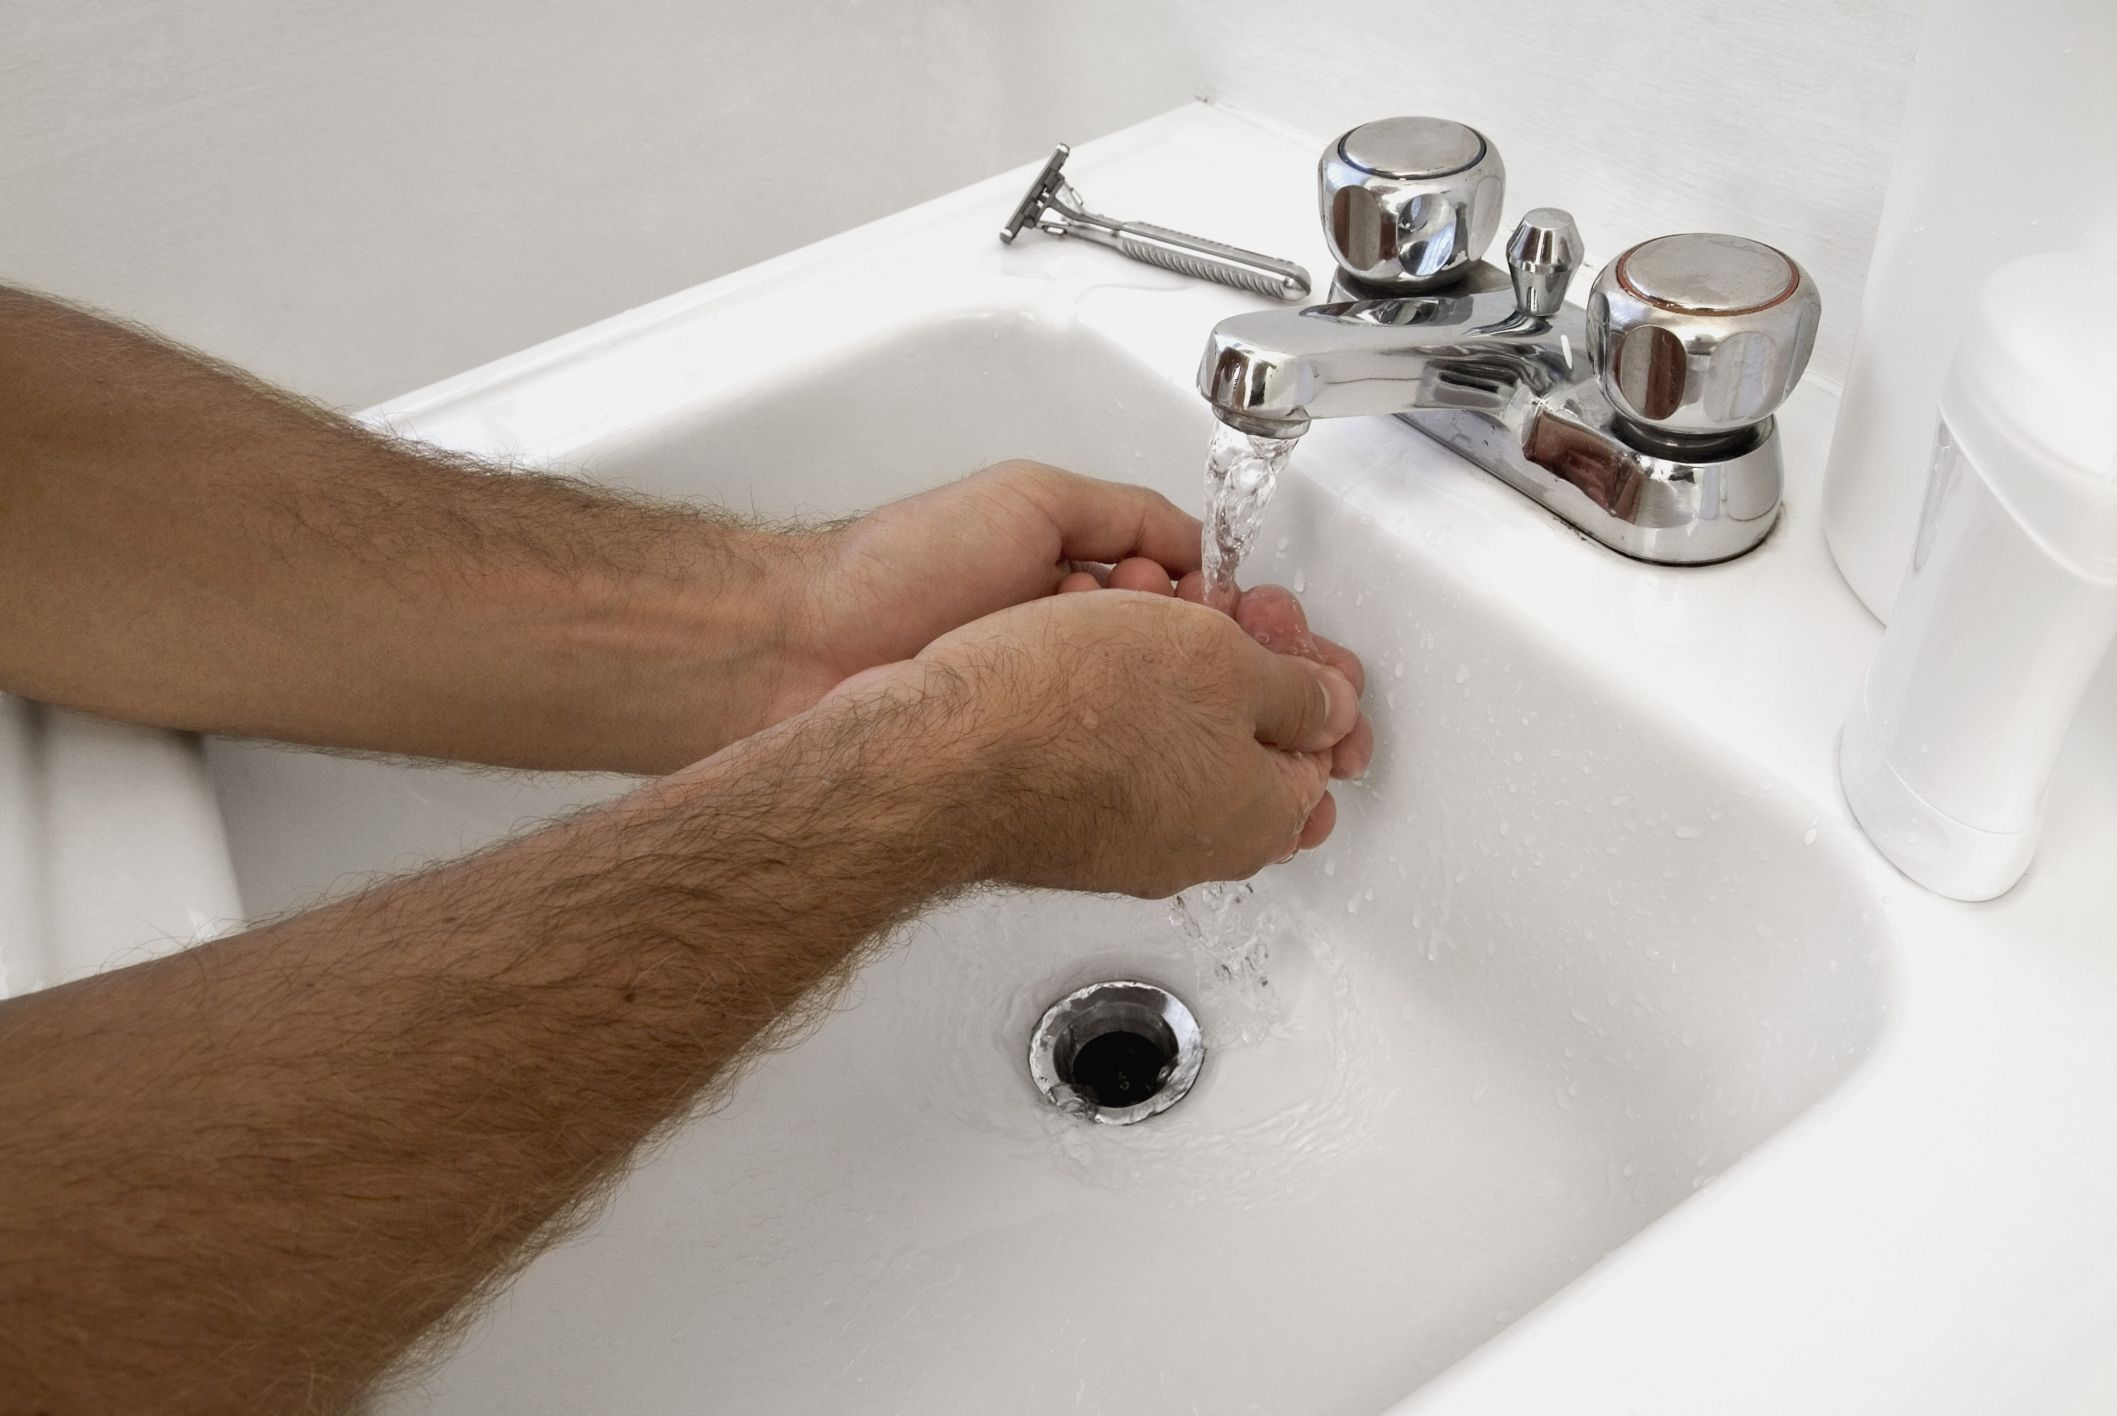 Lavatory Sink Mold Musty Smell Bathroom Drain Smelly Sink Sink Drain